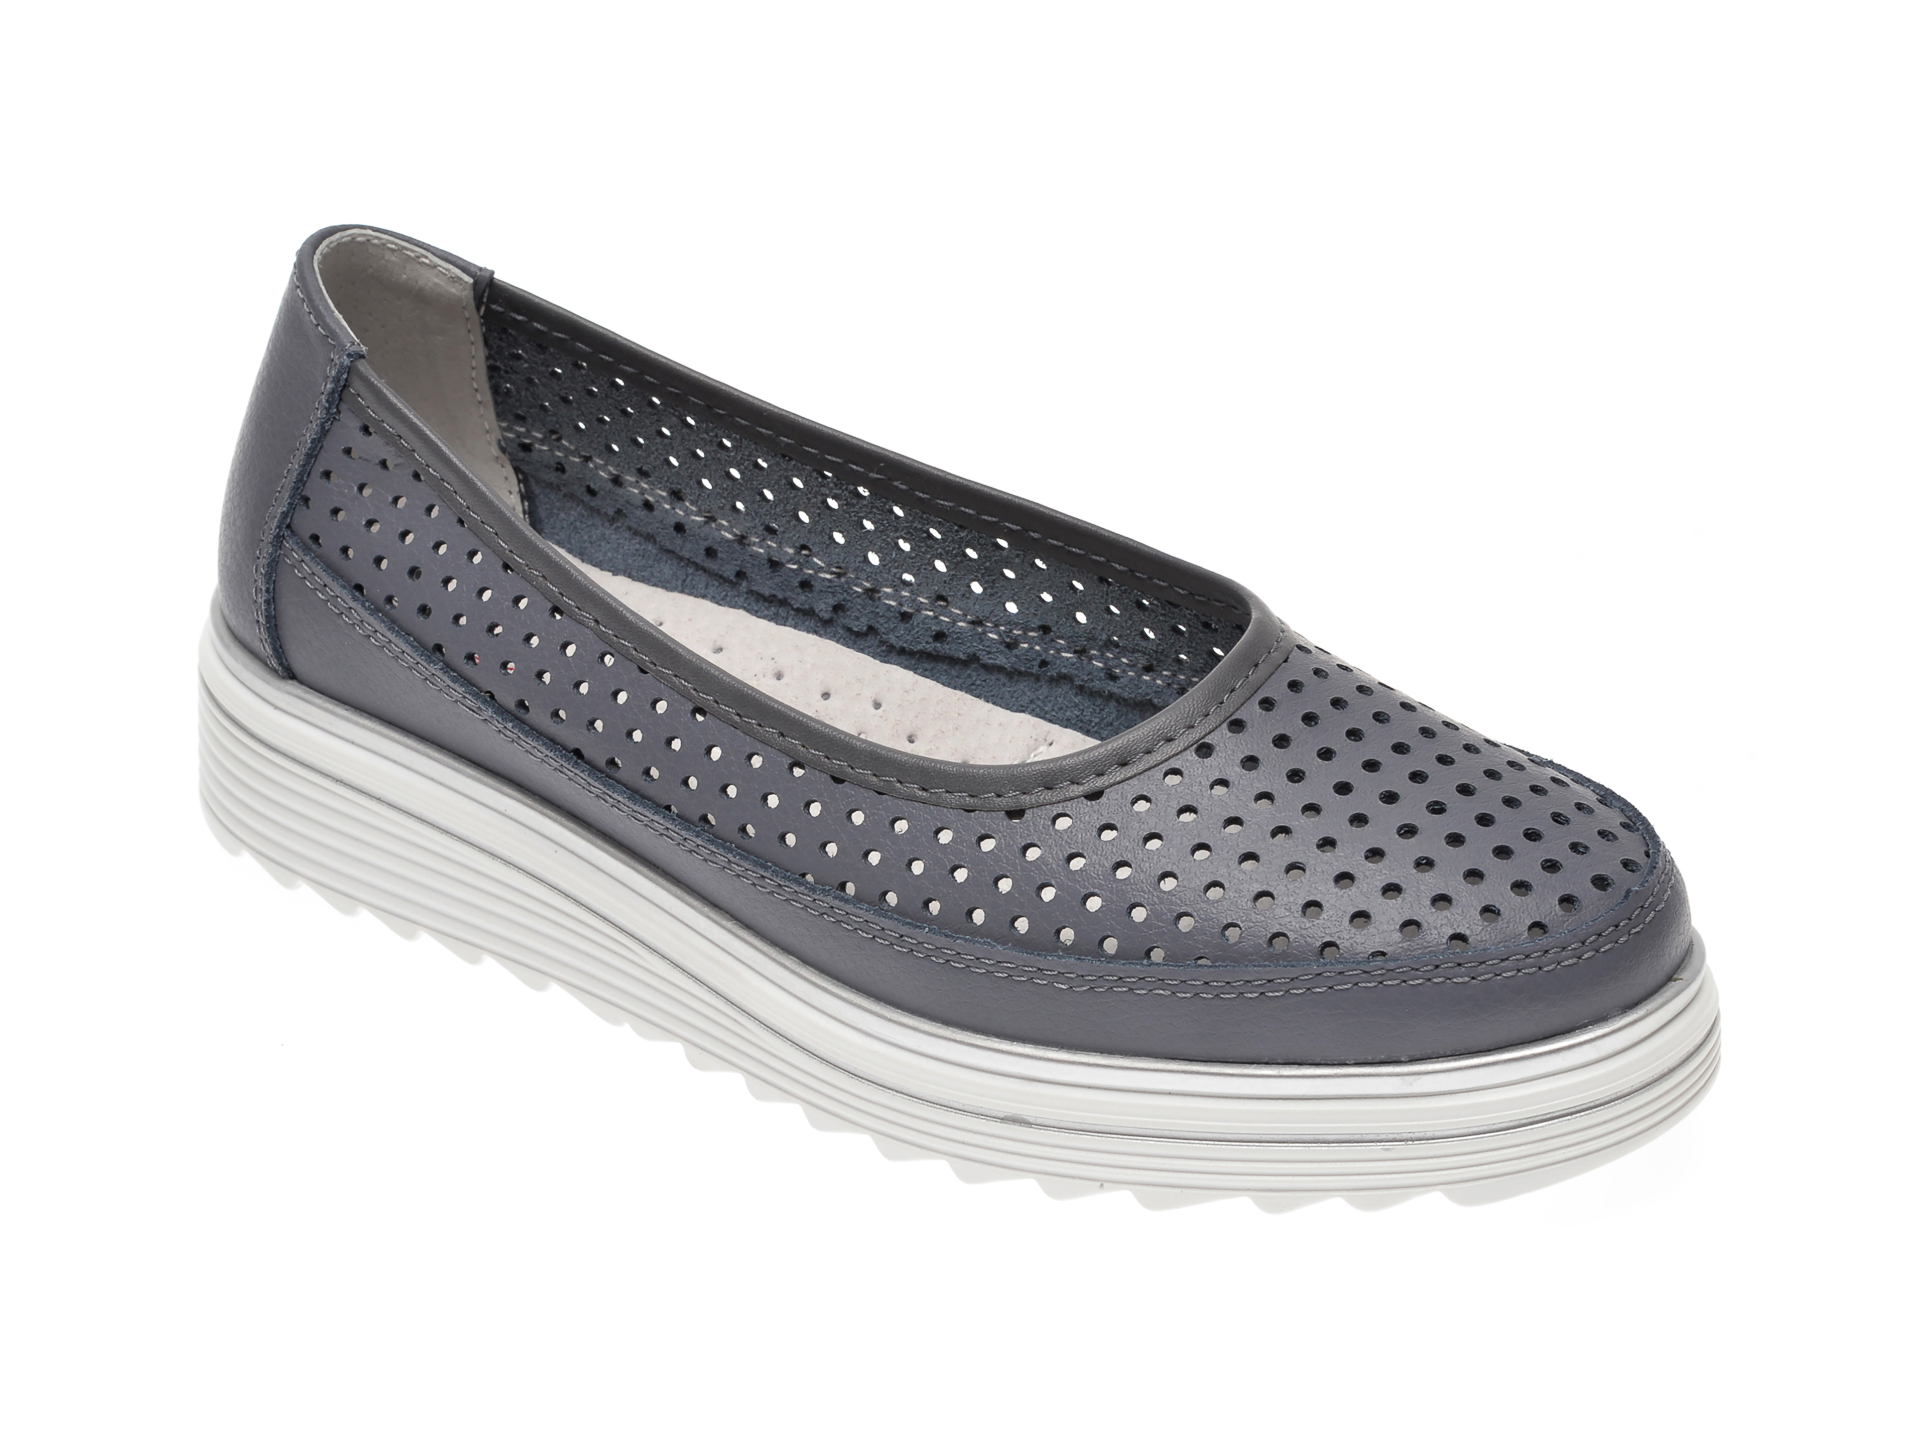 Pantofi IMAGE gri, 805, din piele naturala